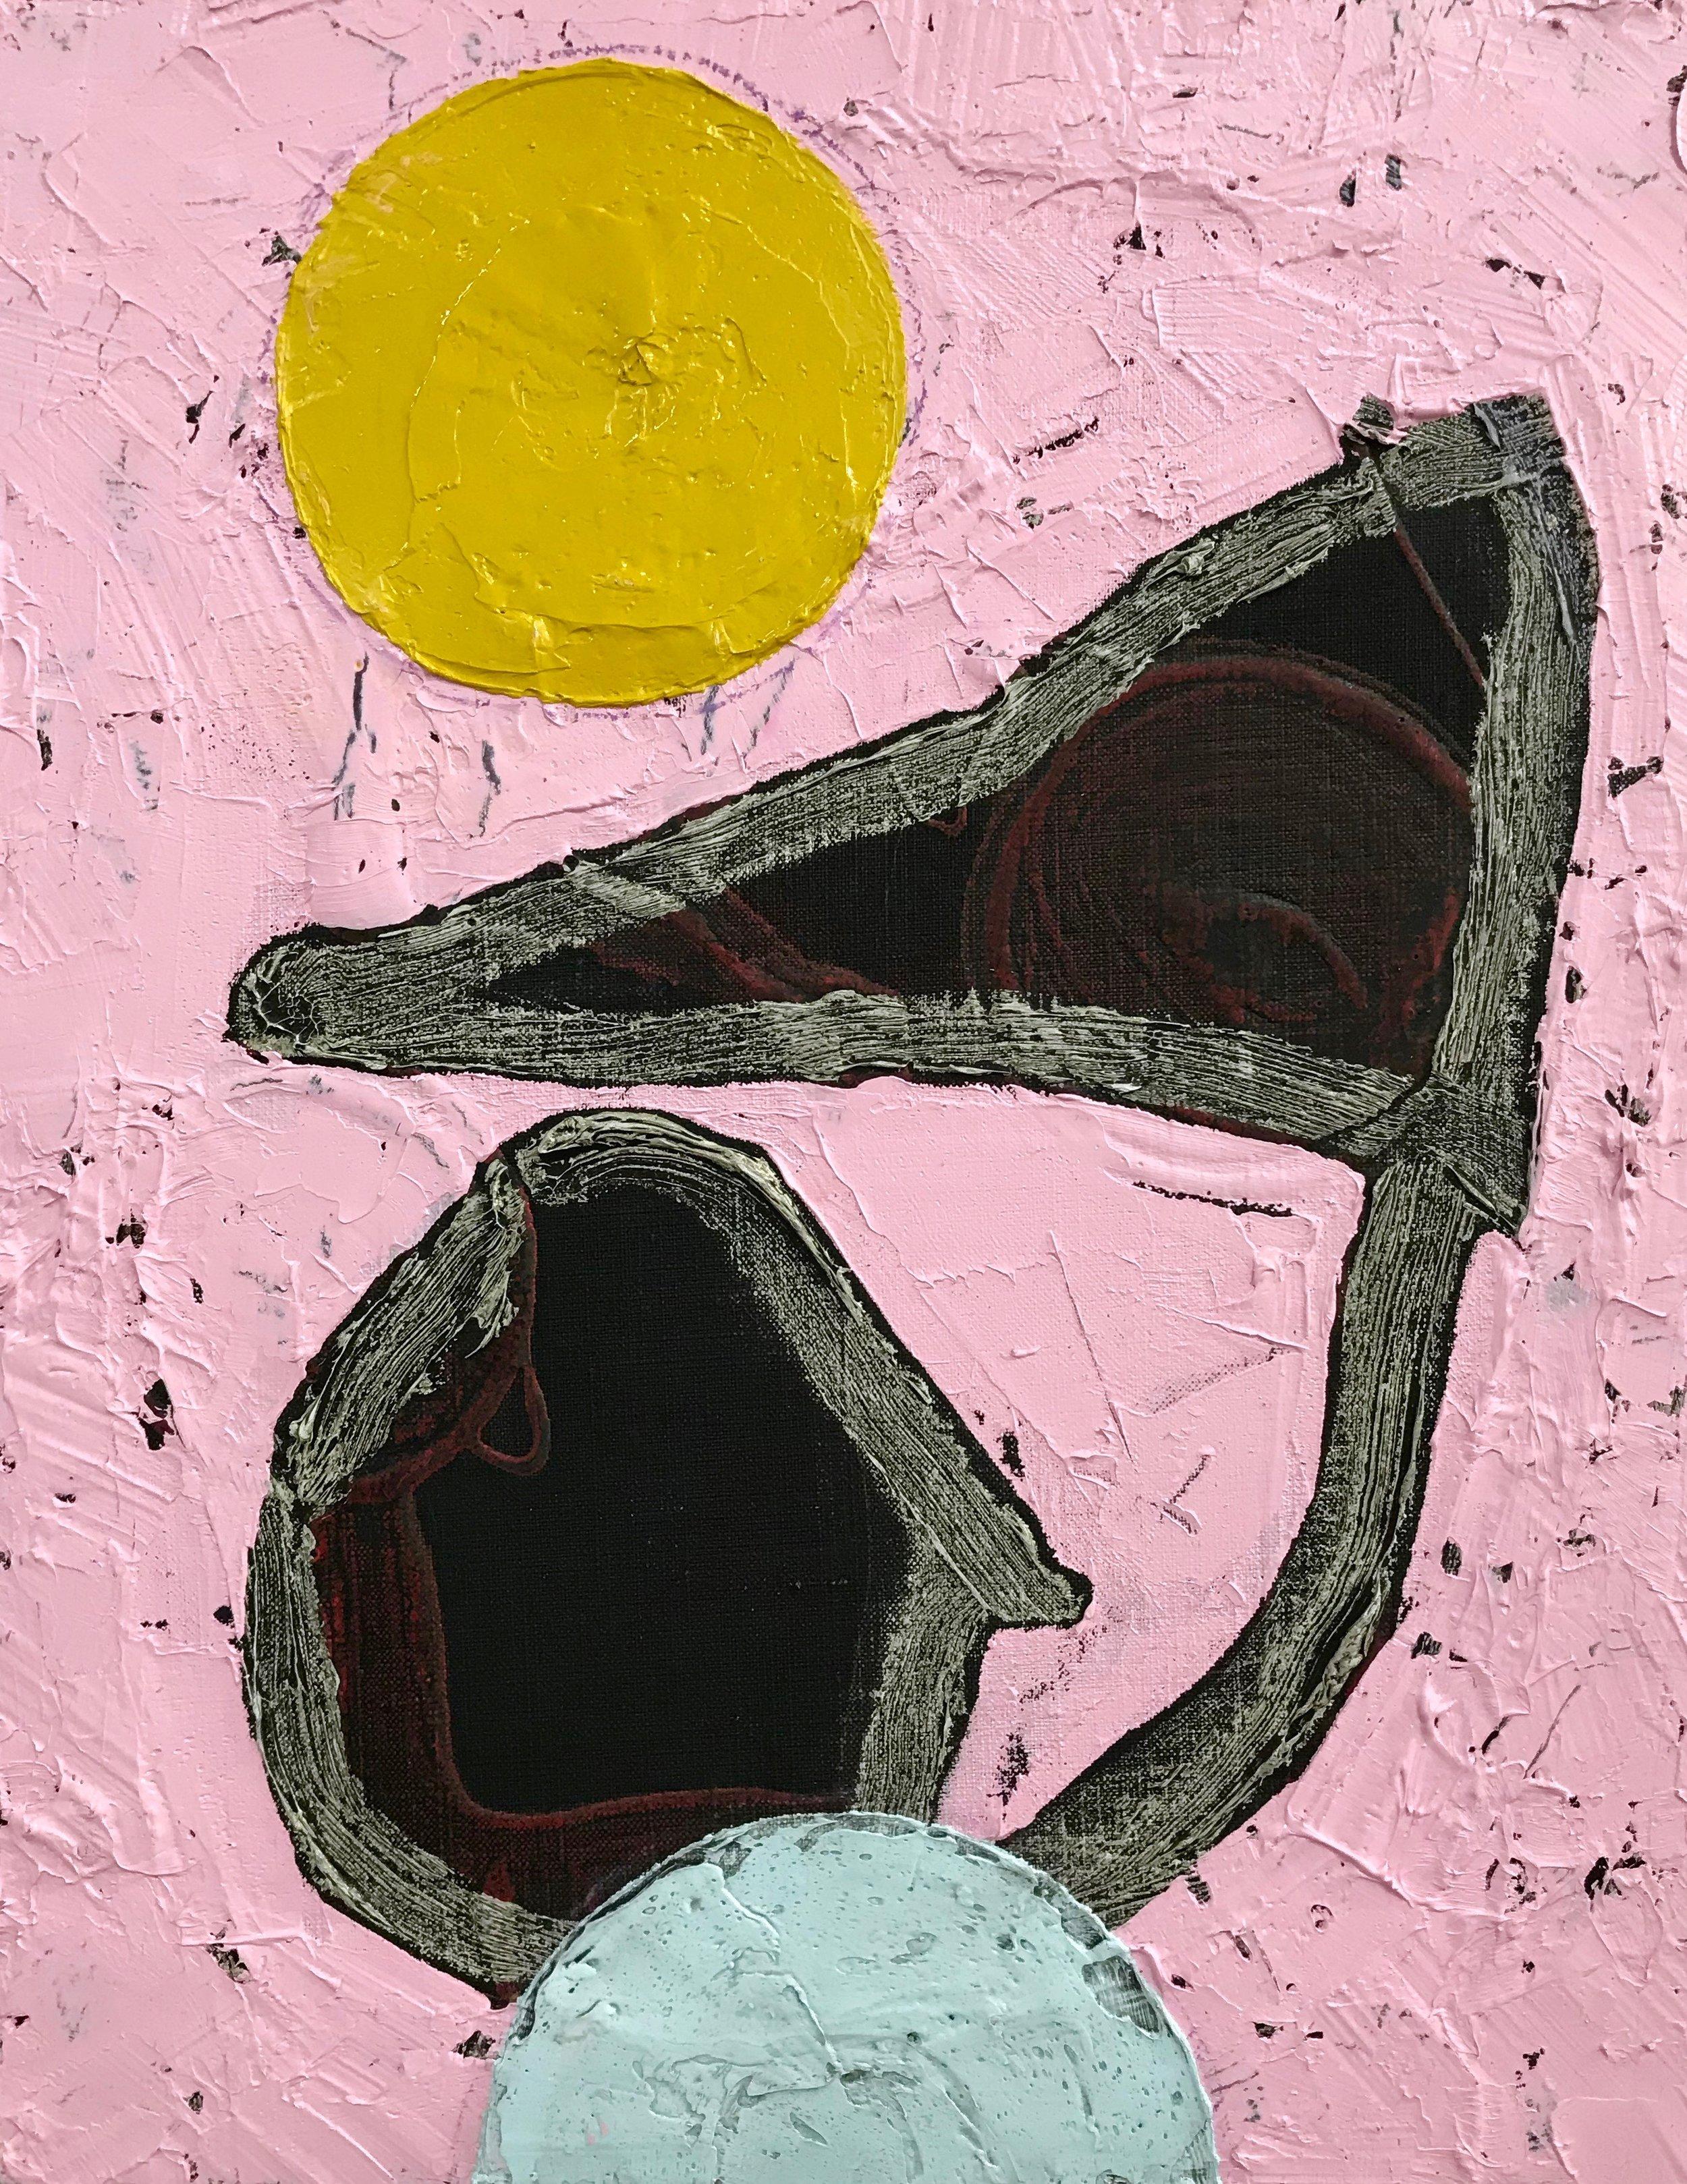 PETER SHARP  Twilight , 2019 oil and acrylic on linen 45 x 36 cm